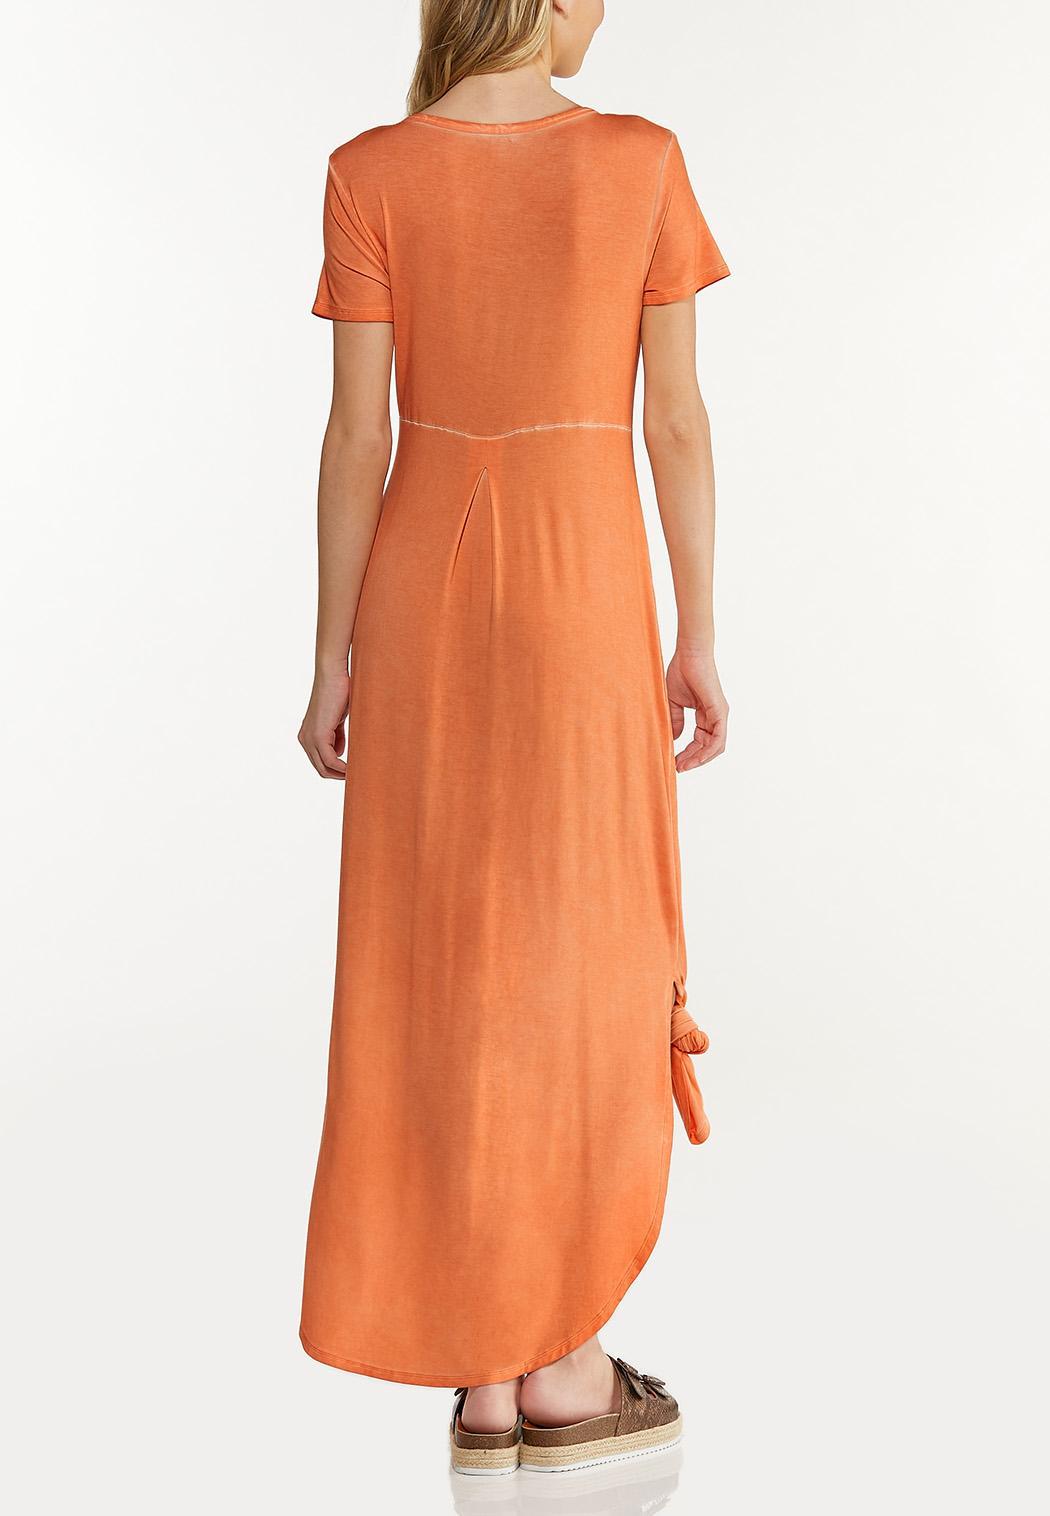 Dyed Knotted Hem Shirt Dress (Item #44545392)